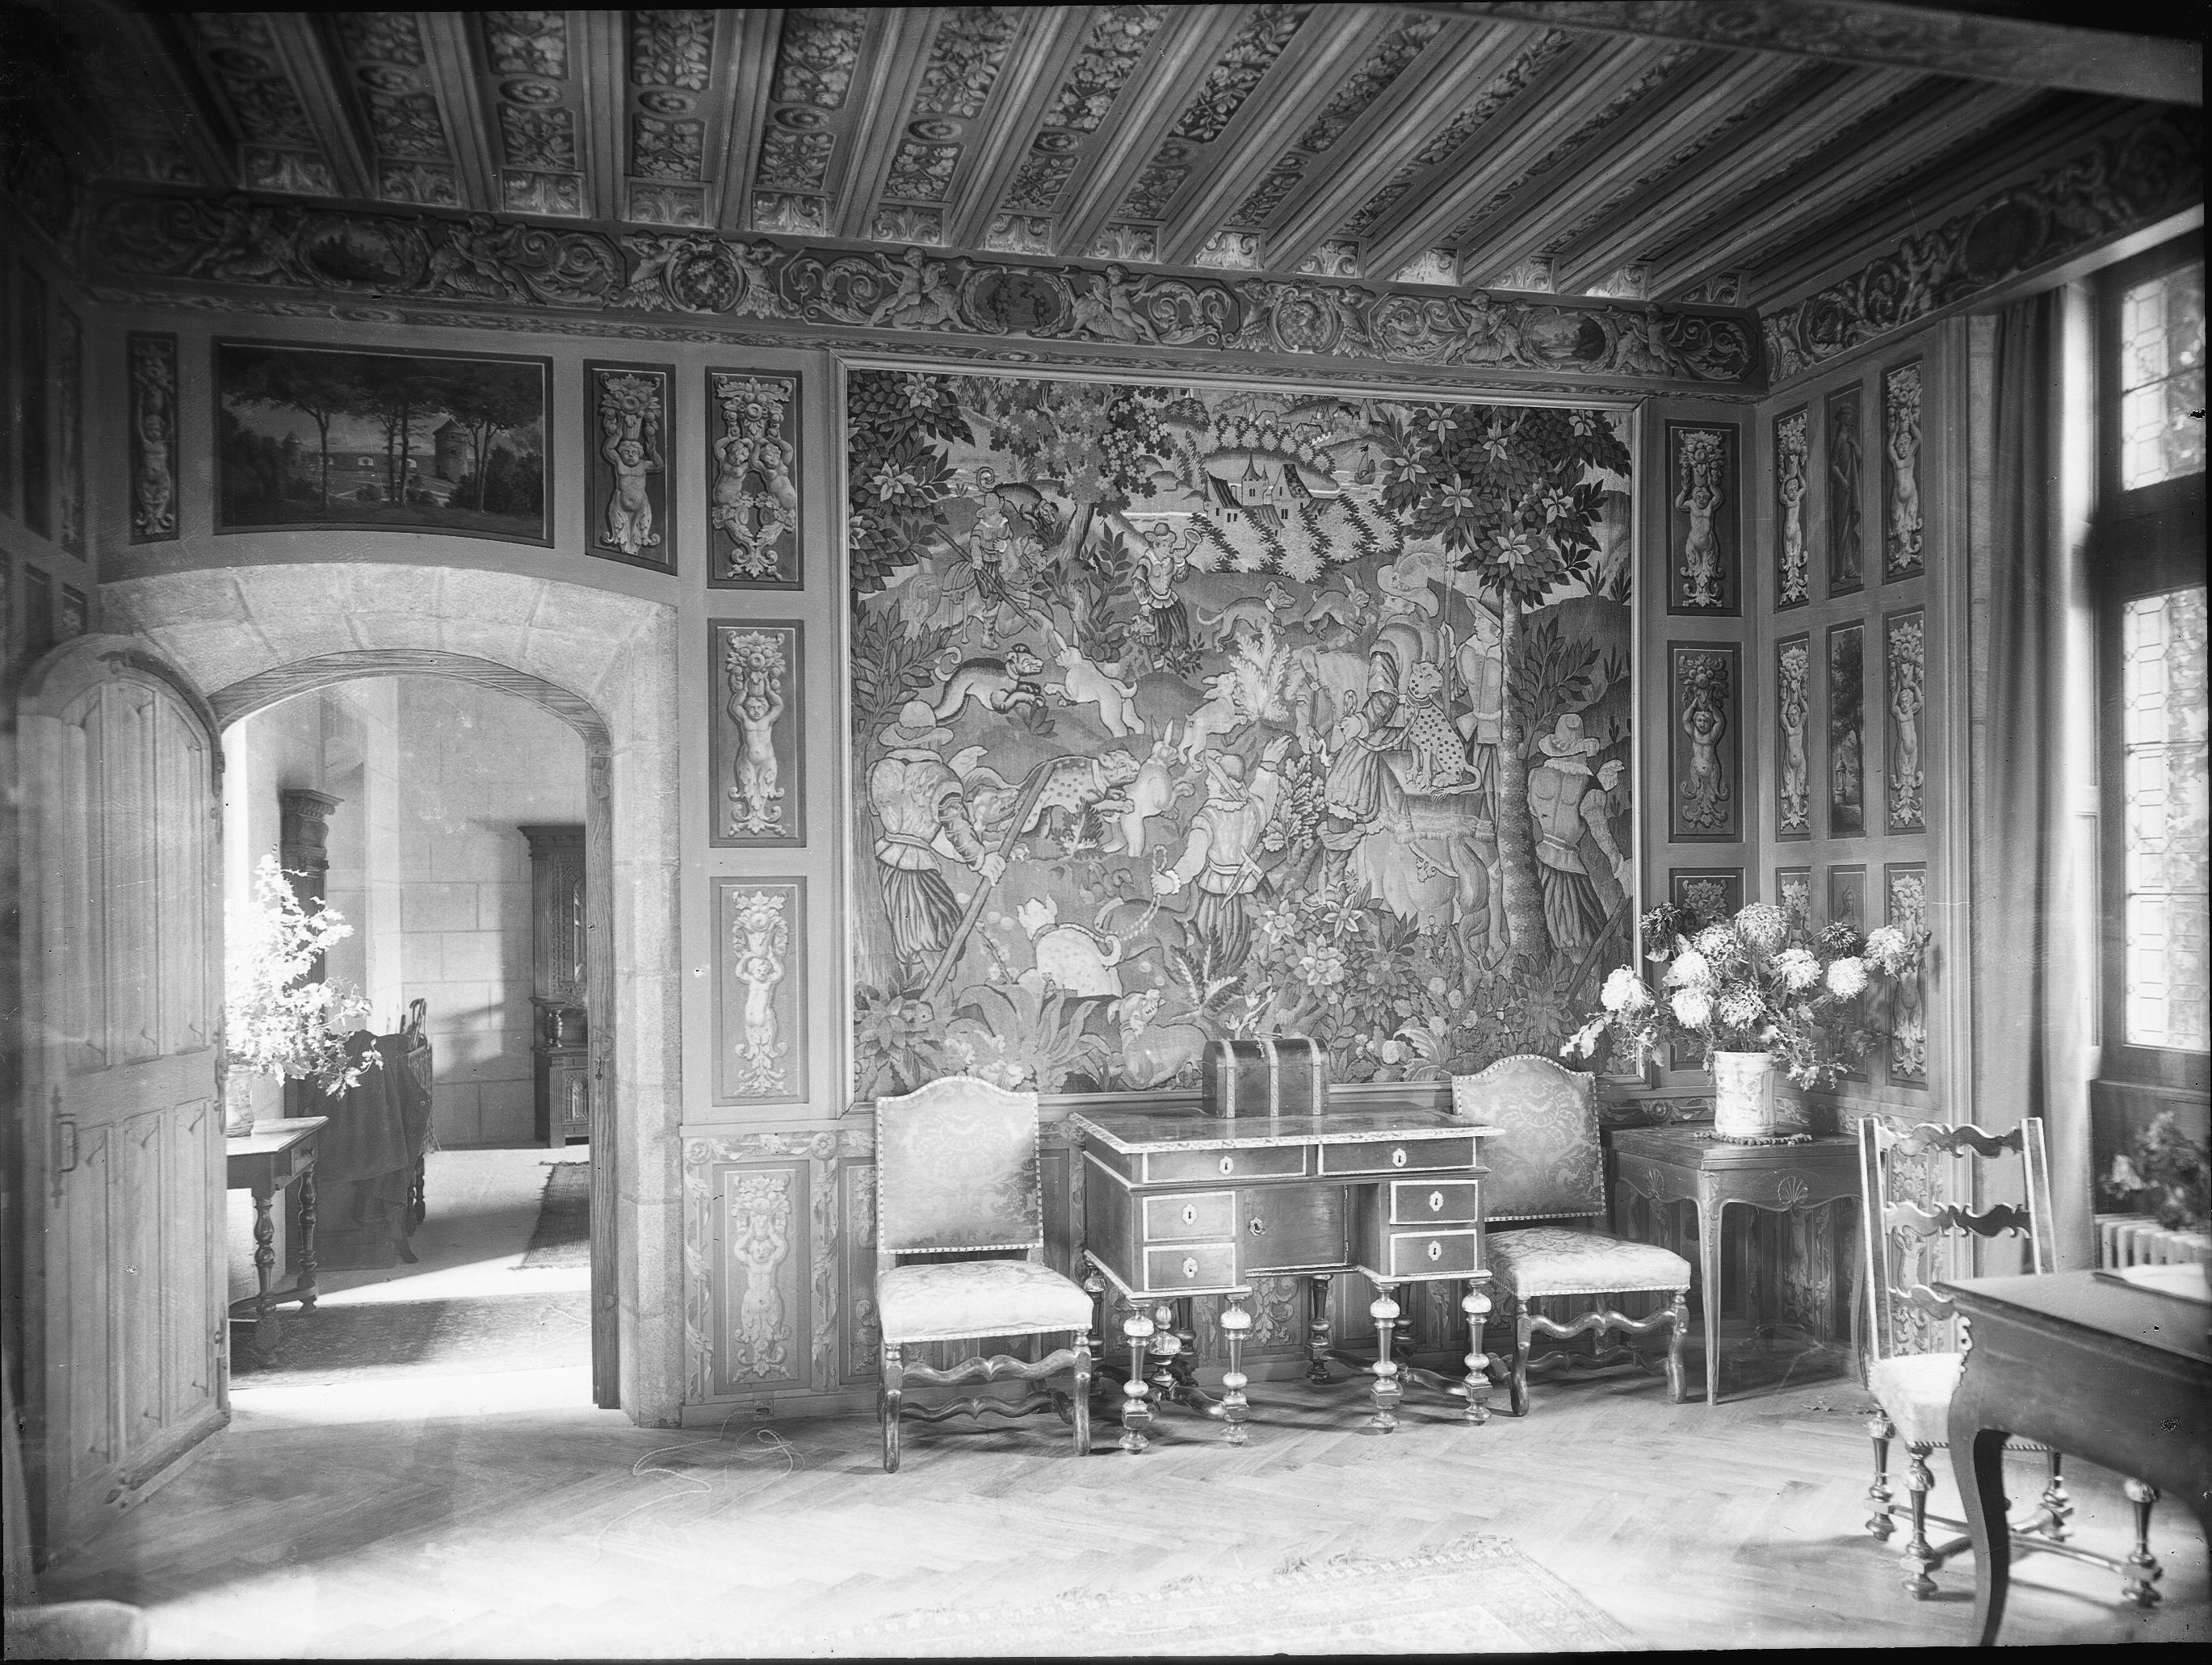 photographes en rh ne alpes ch teau grande tapisserie murale. Black Bedroom Furniture Sets. Home Design Ideas